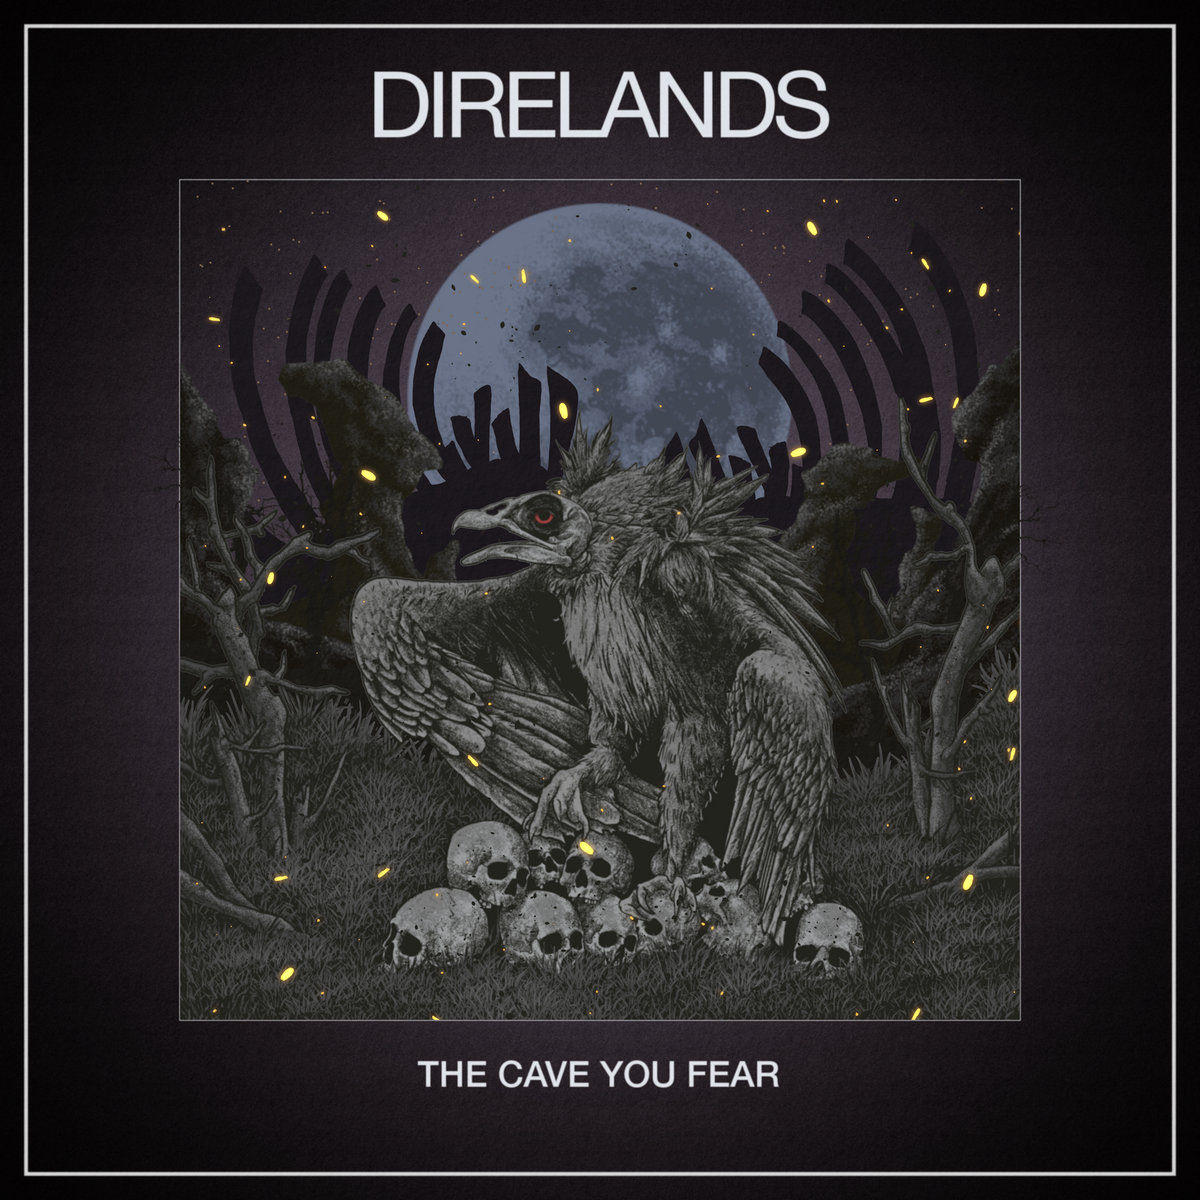 www.facebook.com/direlands